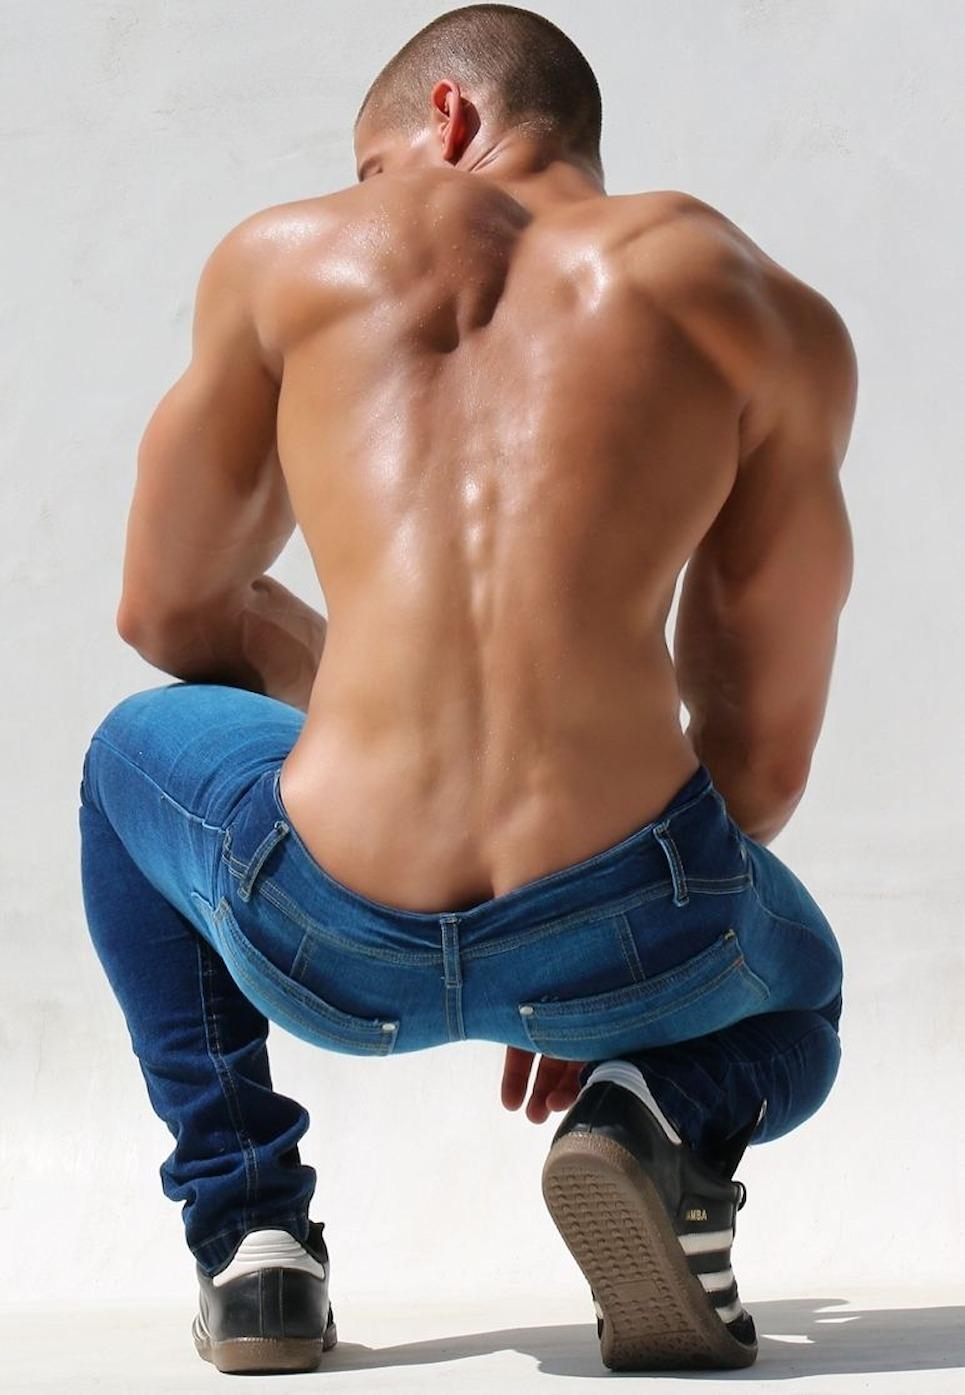 анус мужчины фото - 1